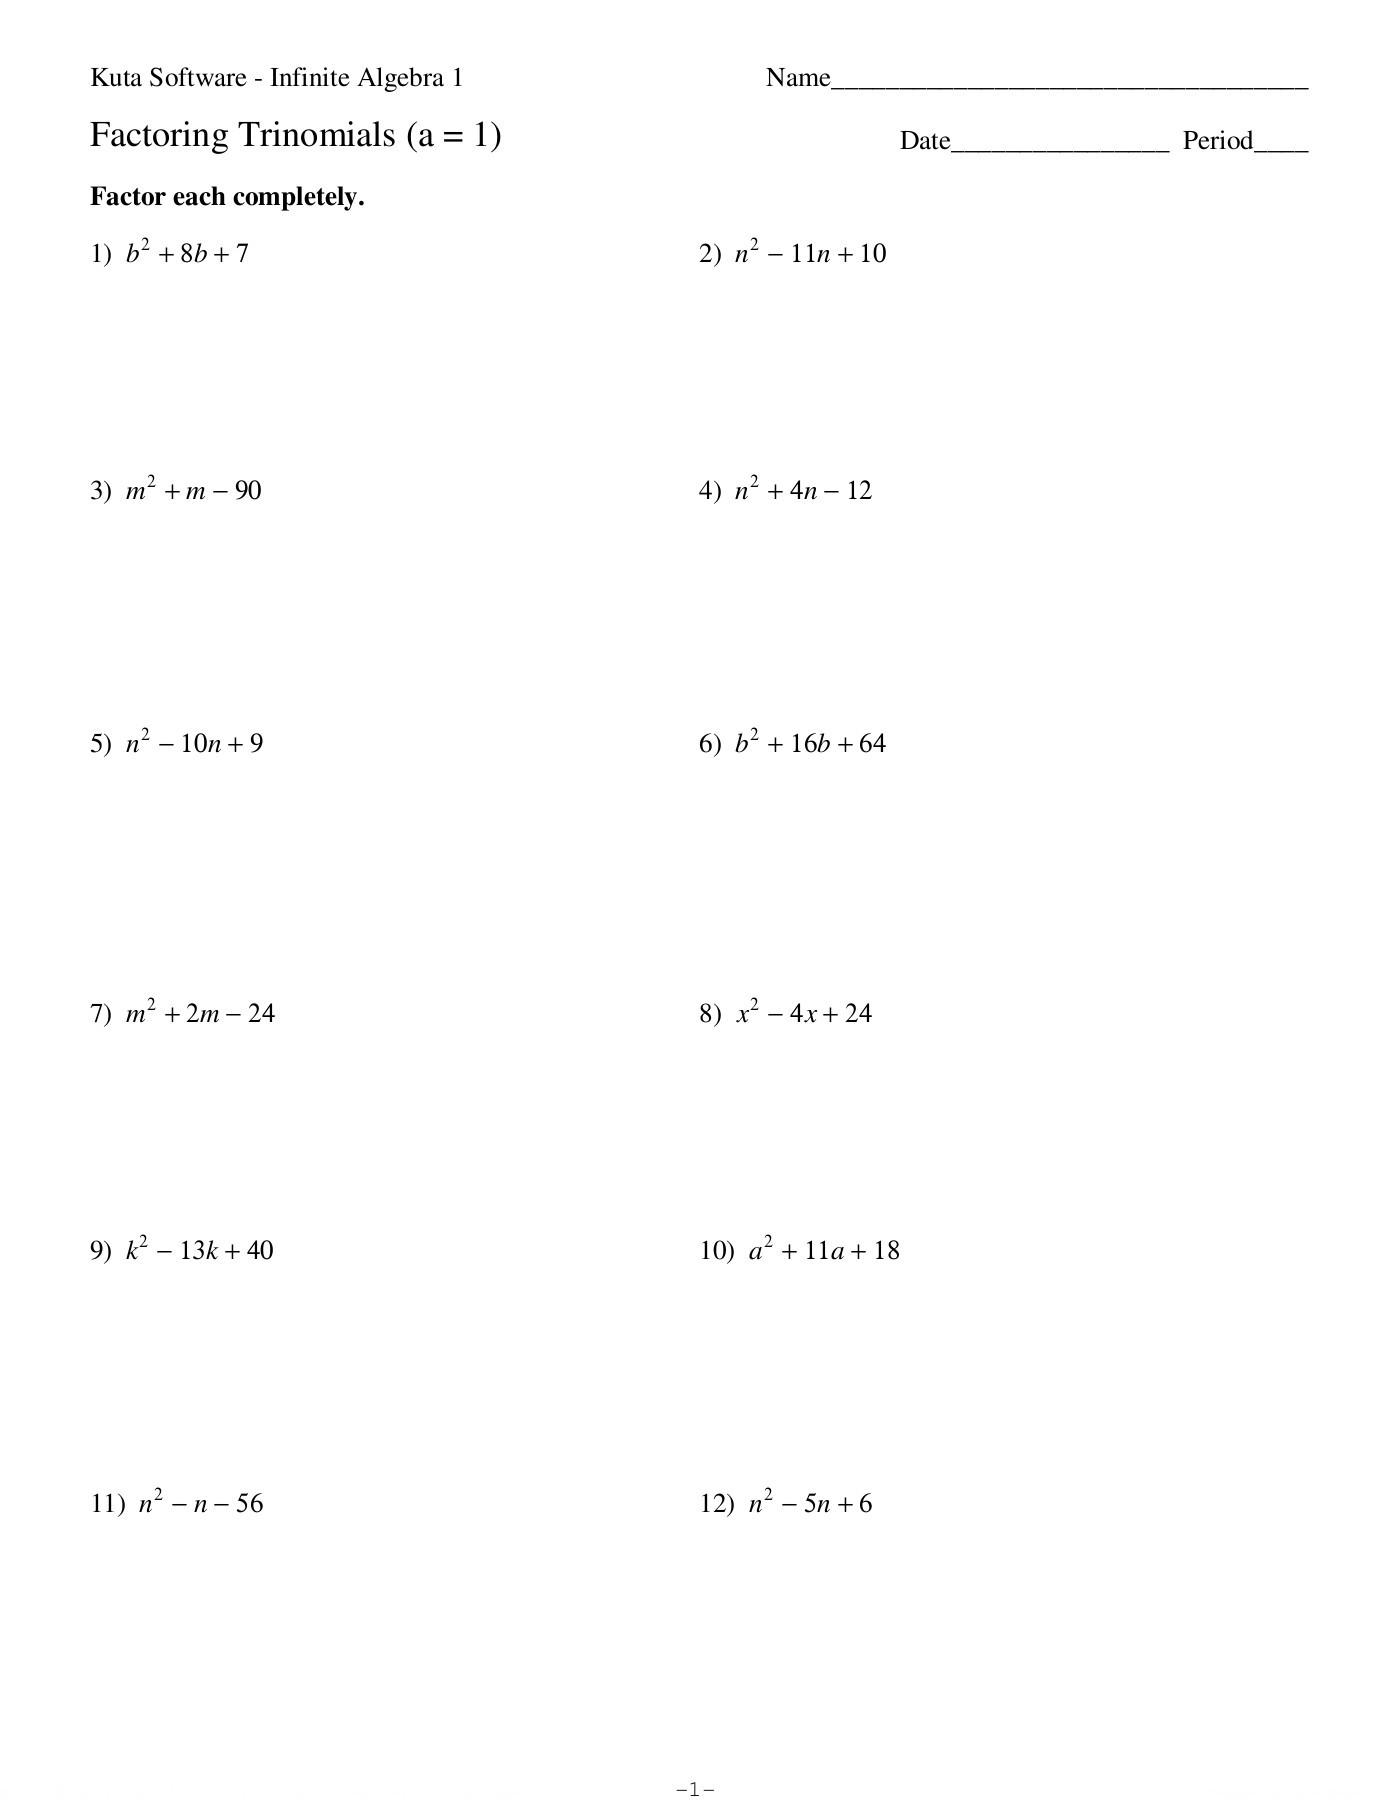 Algebra 2 Factoring Worksheet Kuta